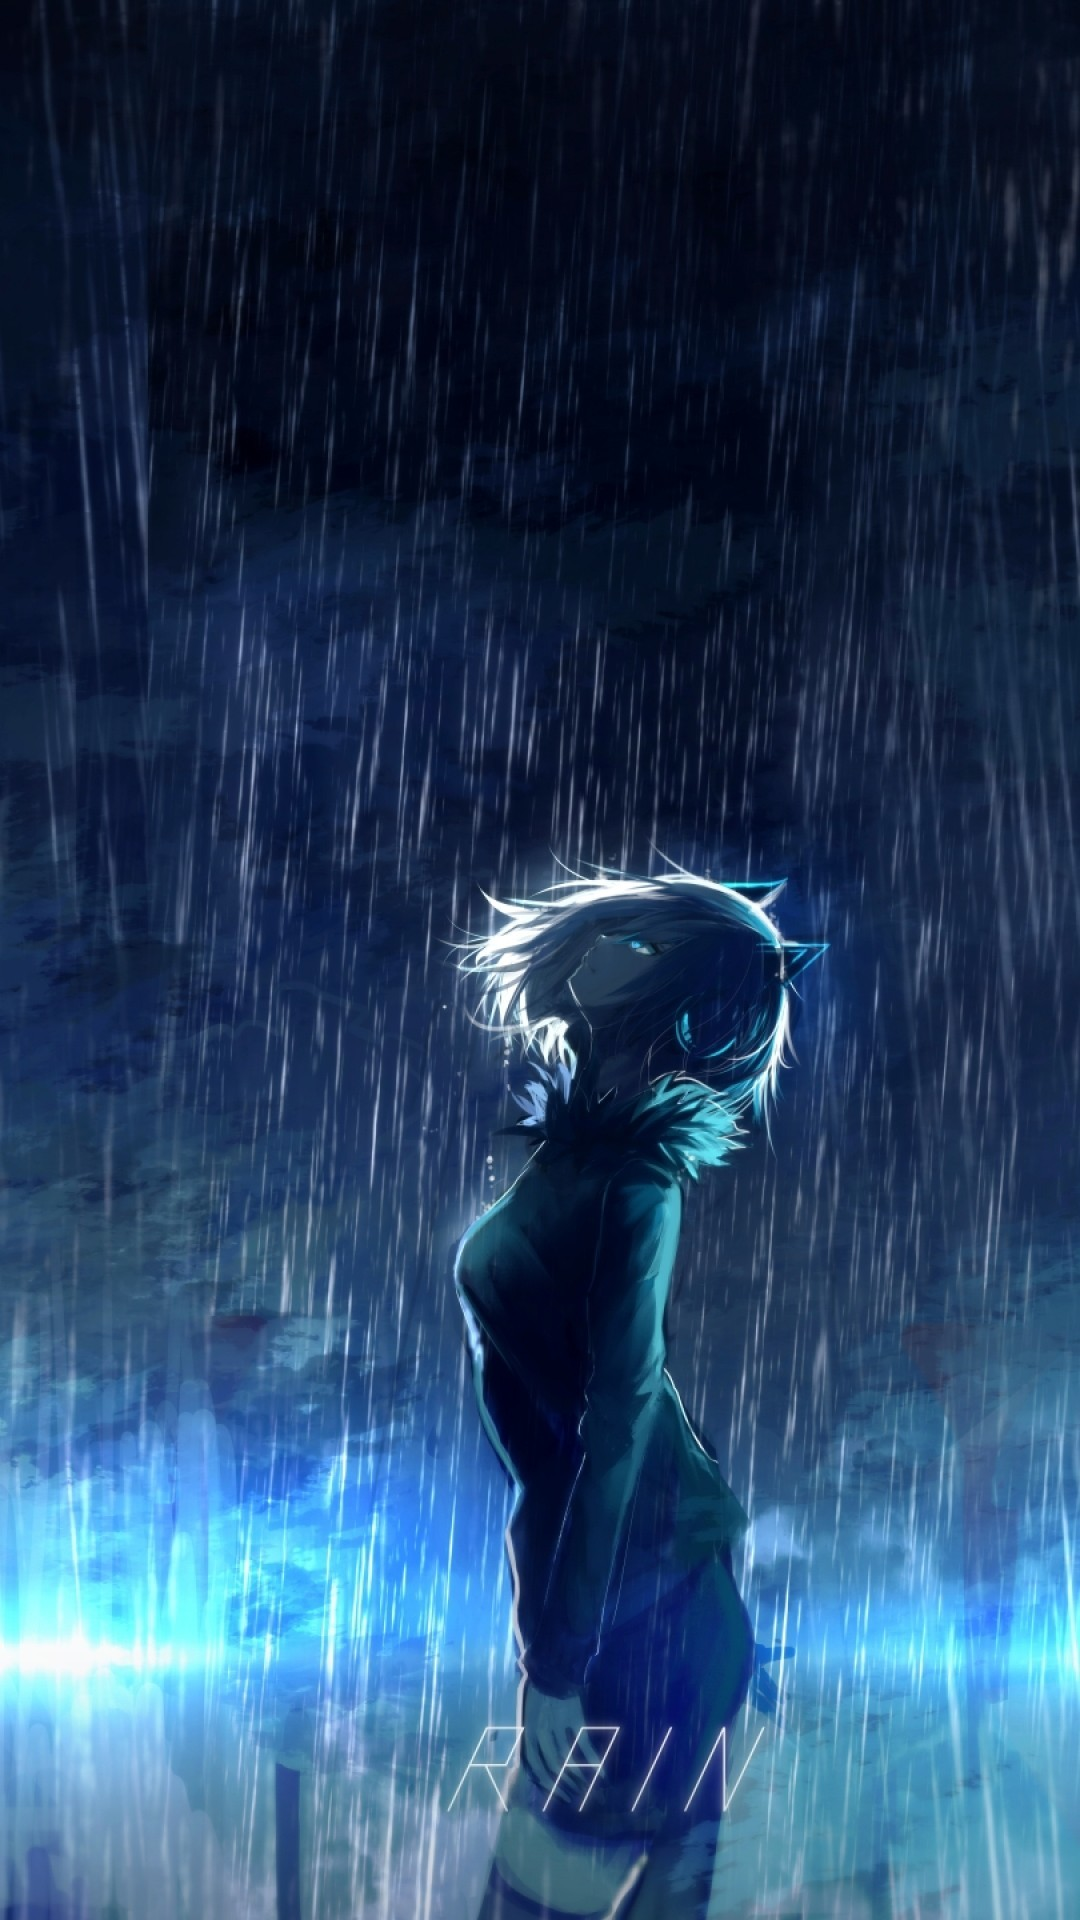 Anime Girl, Scenic, Raining, Animal Ears, Profile View, Night, Dark